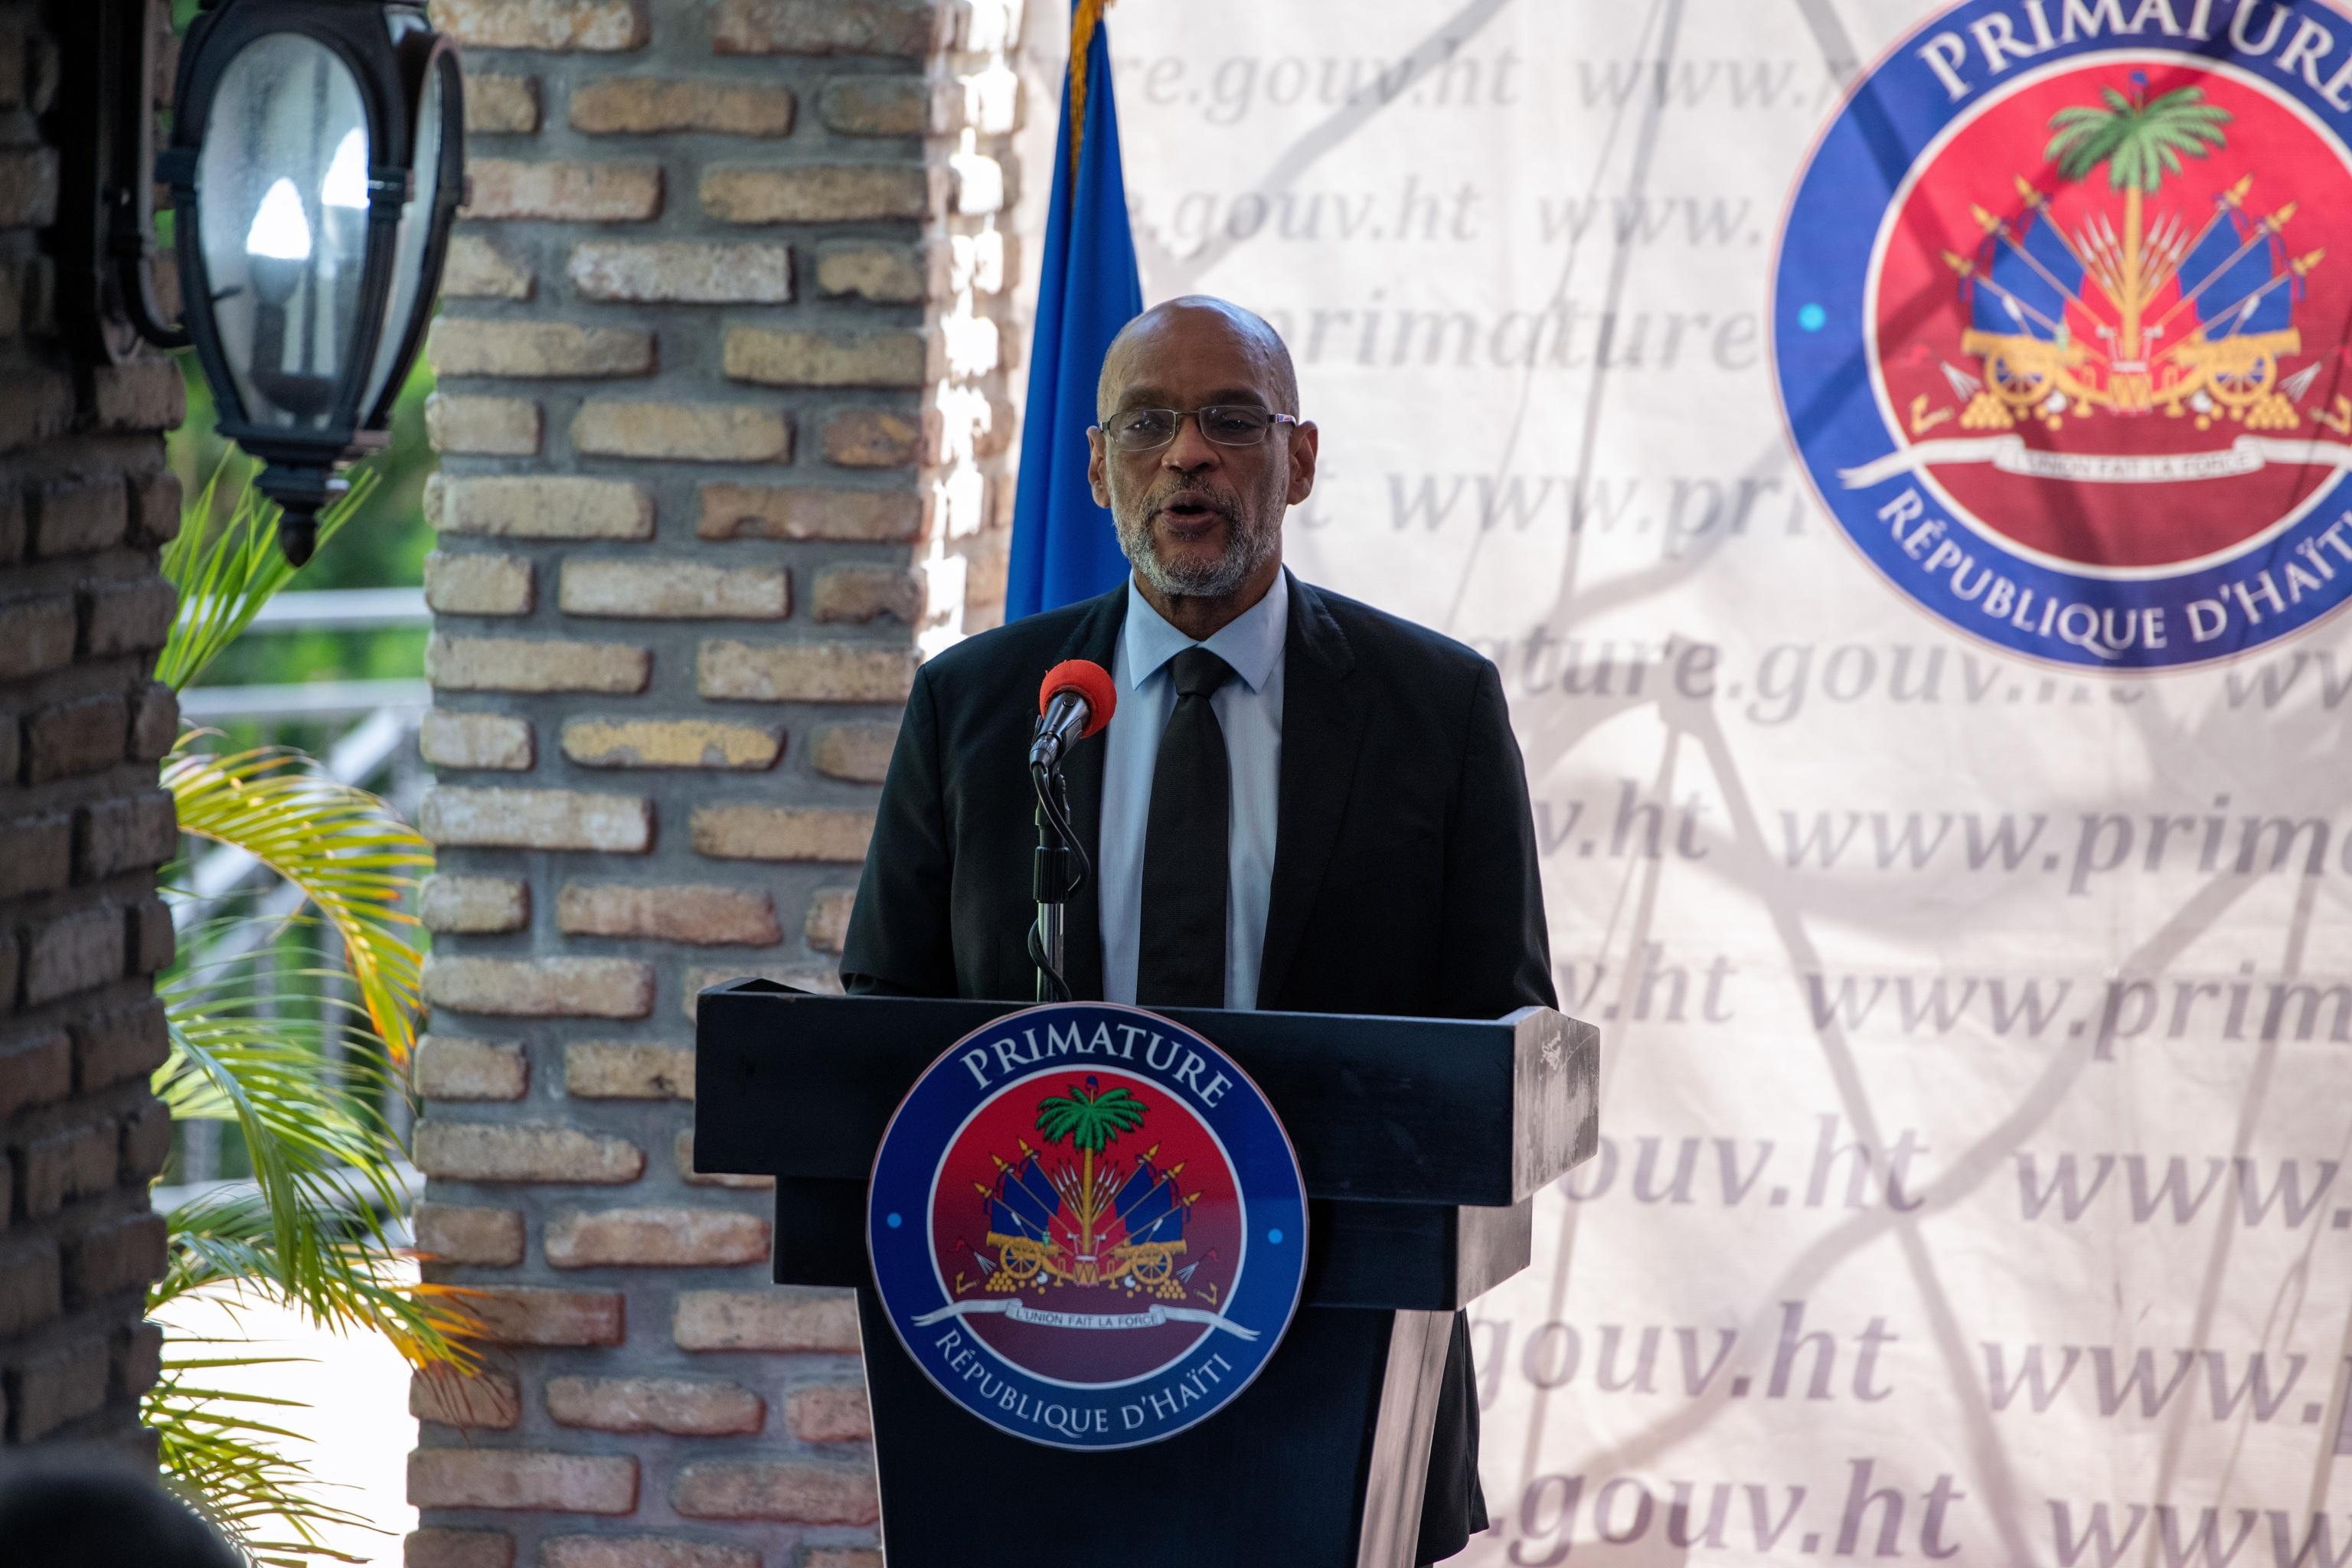 The Prime Minister of Haiti